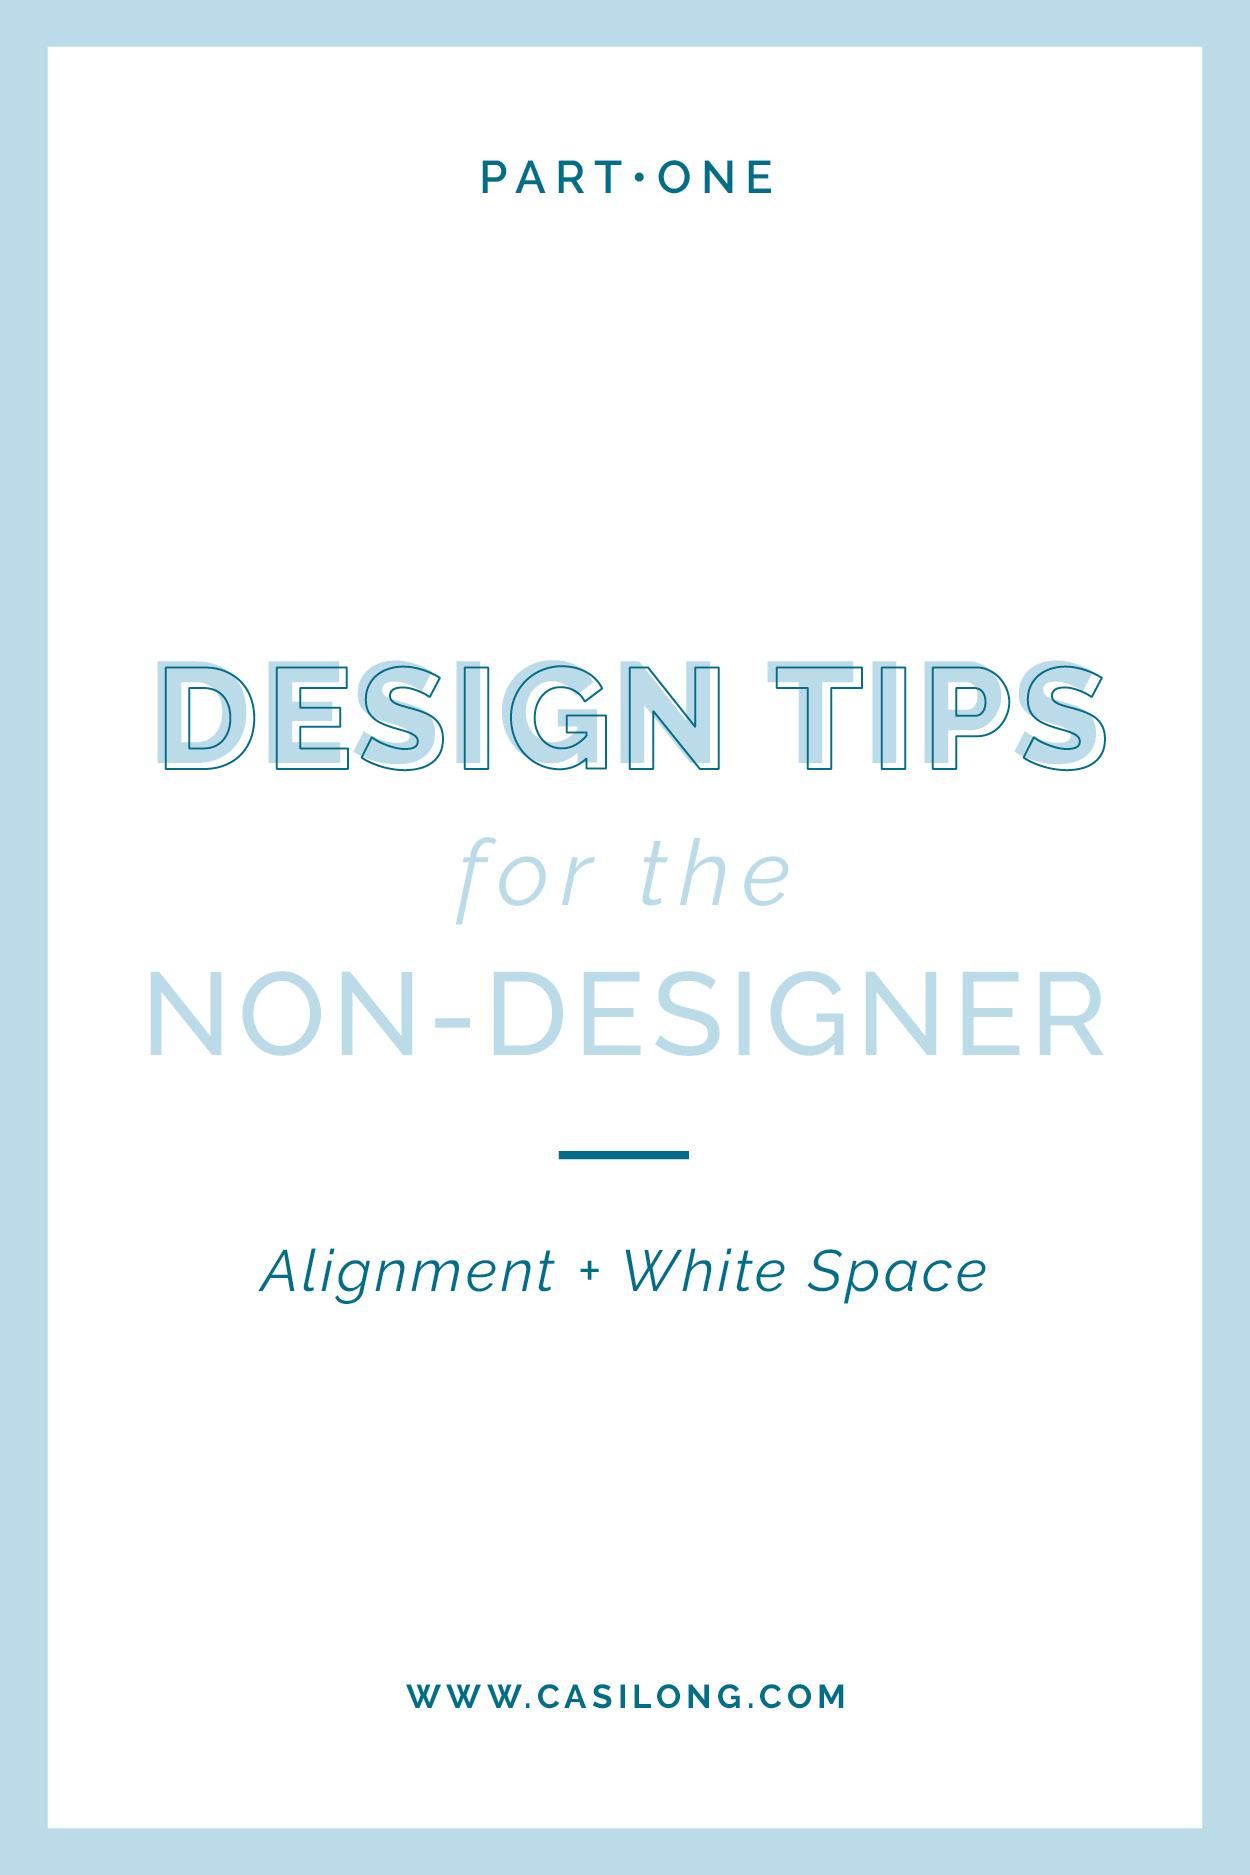 Design Tips for the Non-Designer Part One   Alignment + White Space   casilong.com/blog   #casilongdesign #fearlesspursuit